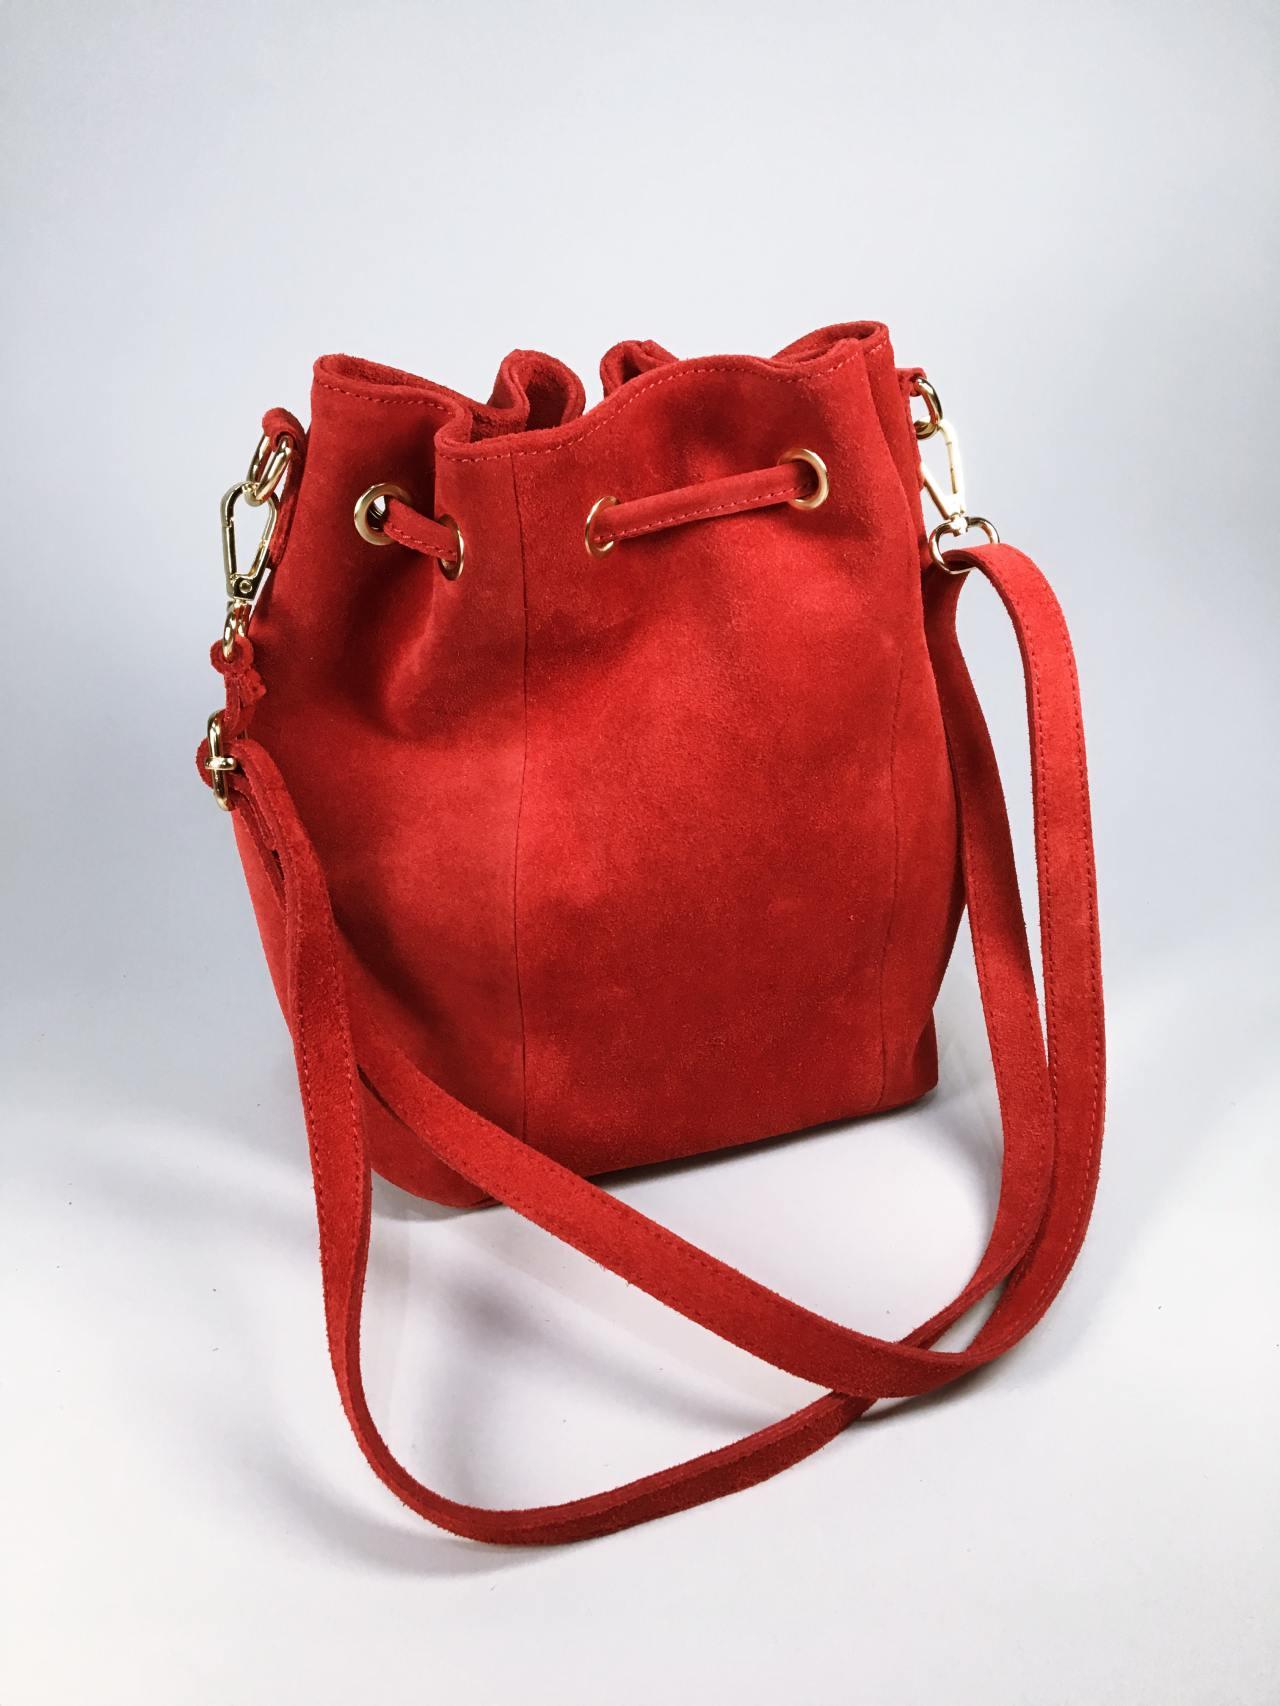 Kožená kabelka Lorra červená – Simm-Fashion.cz c6eee5404c